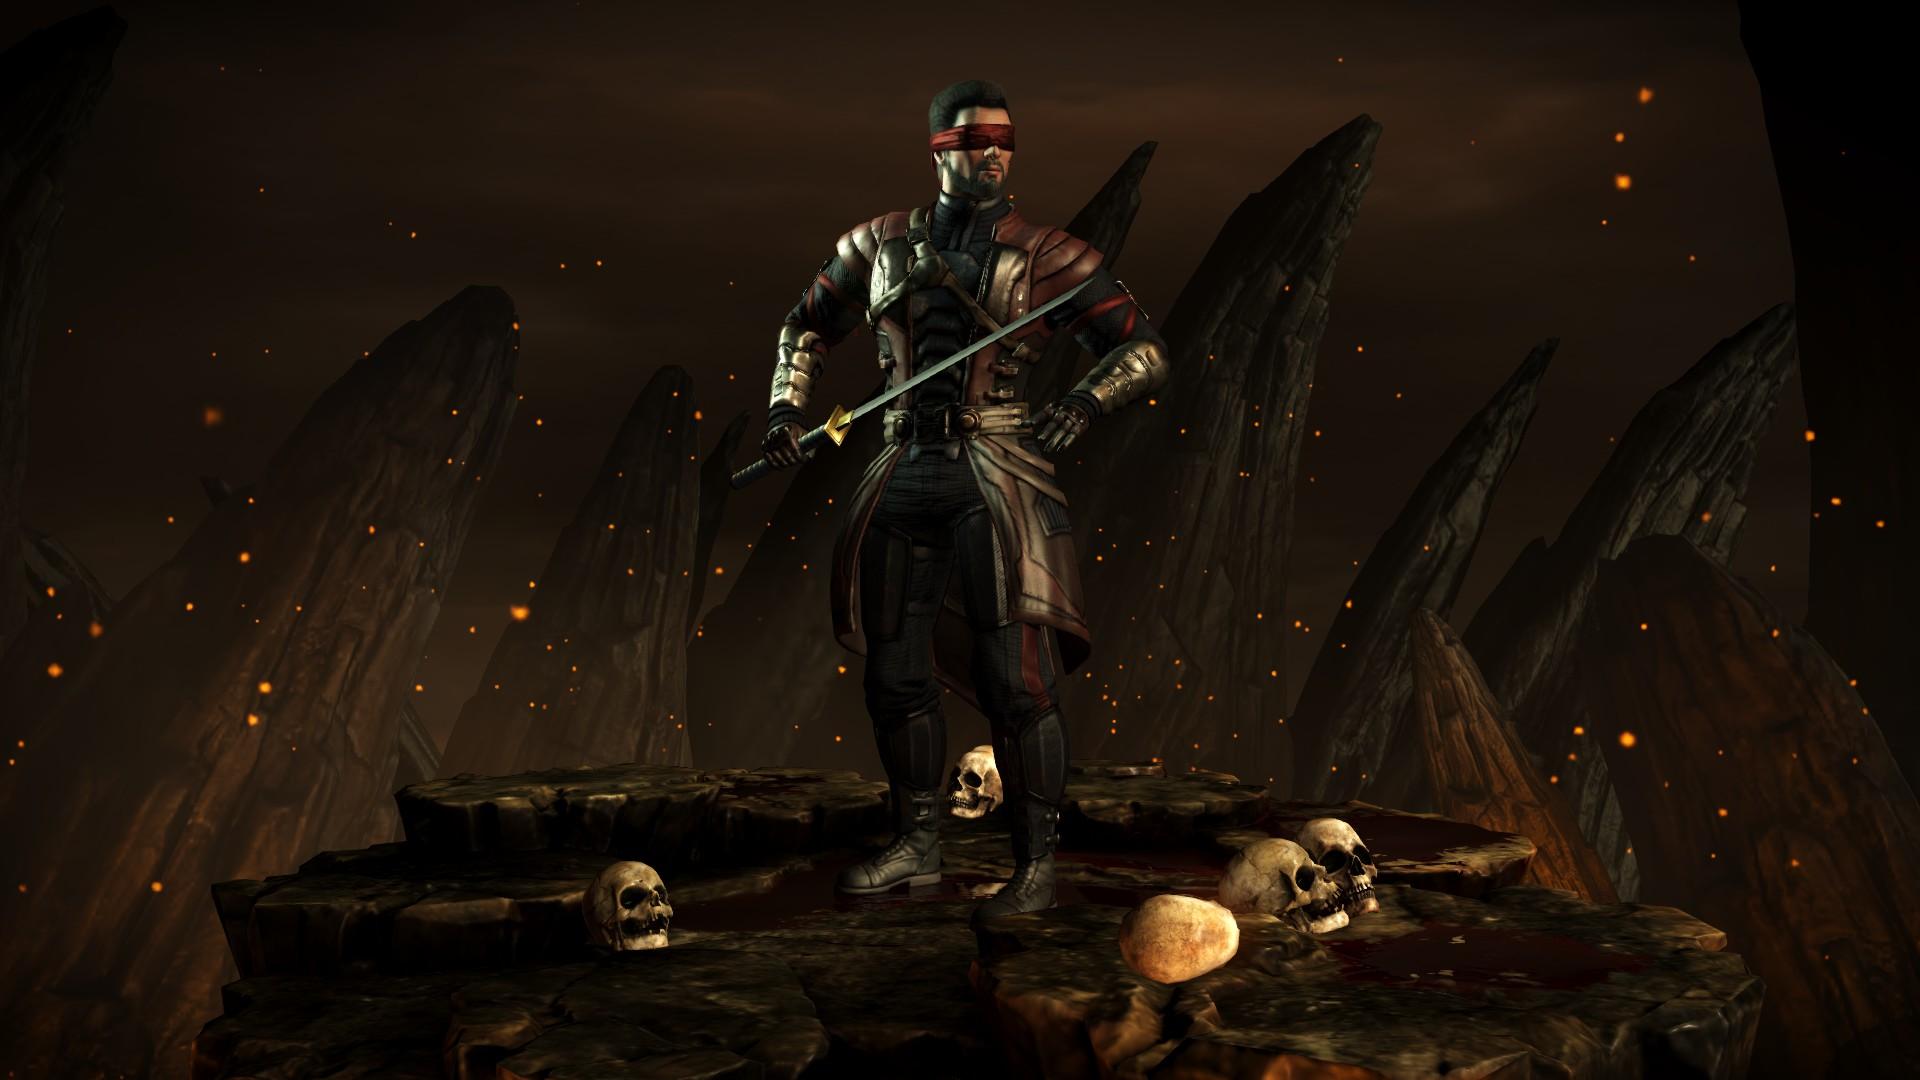 Кенши (Стиль: Баланс) - Mortal Kombat X Кенши